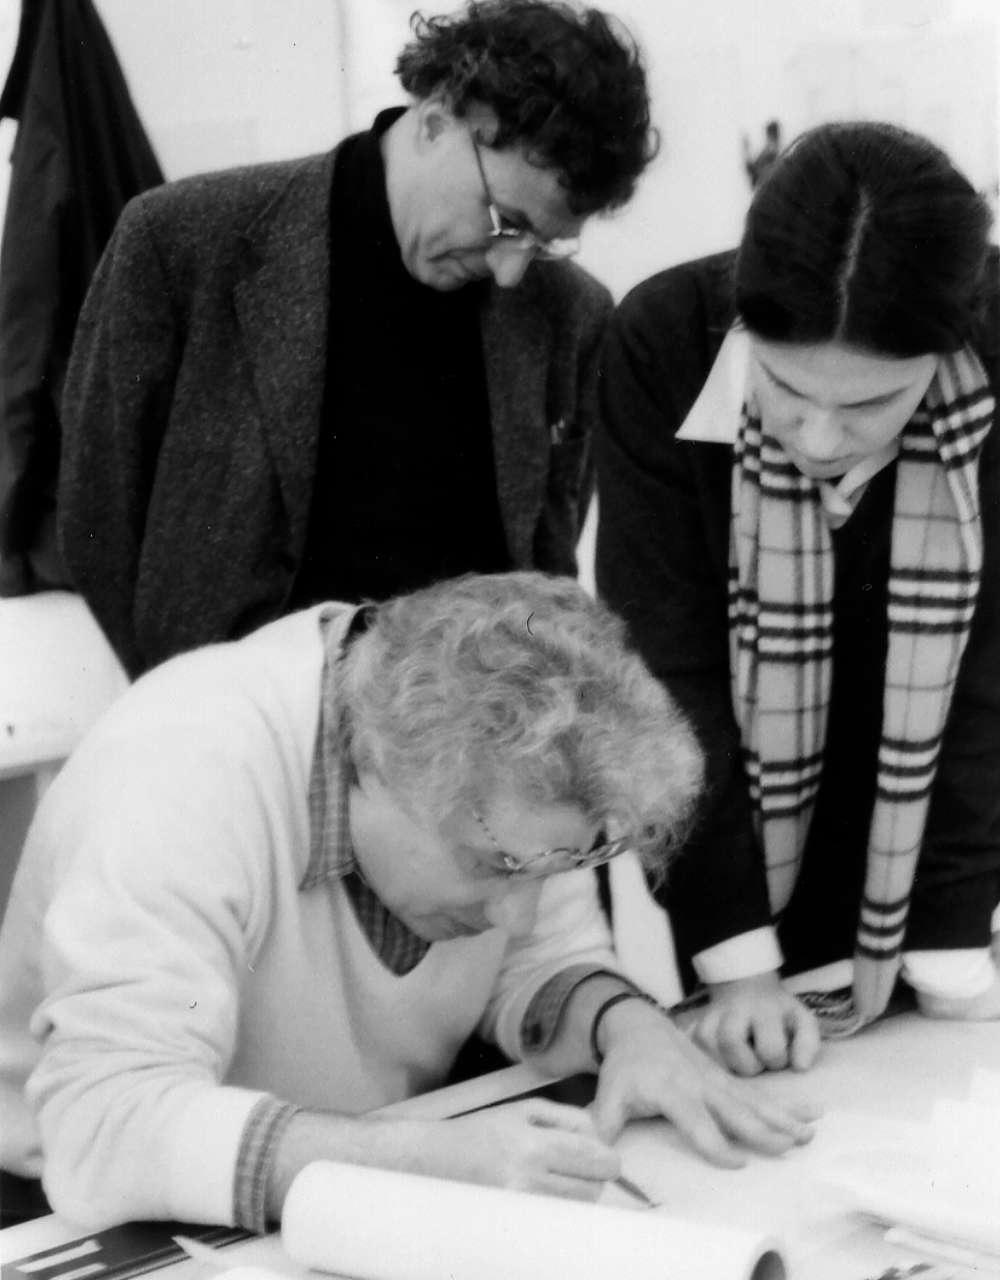 Mario Botta, Gabriele Cappellato